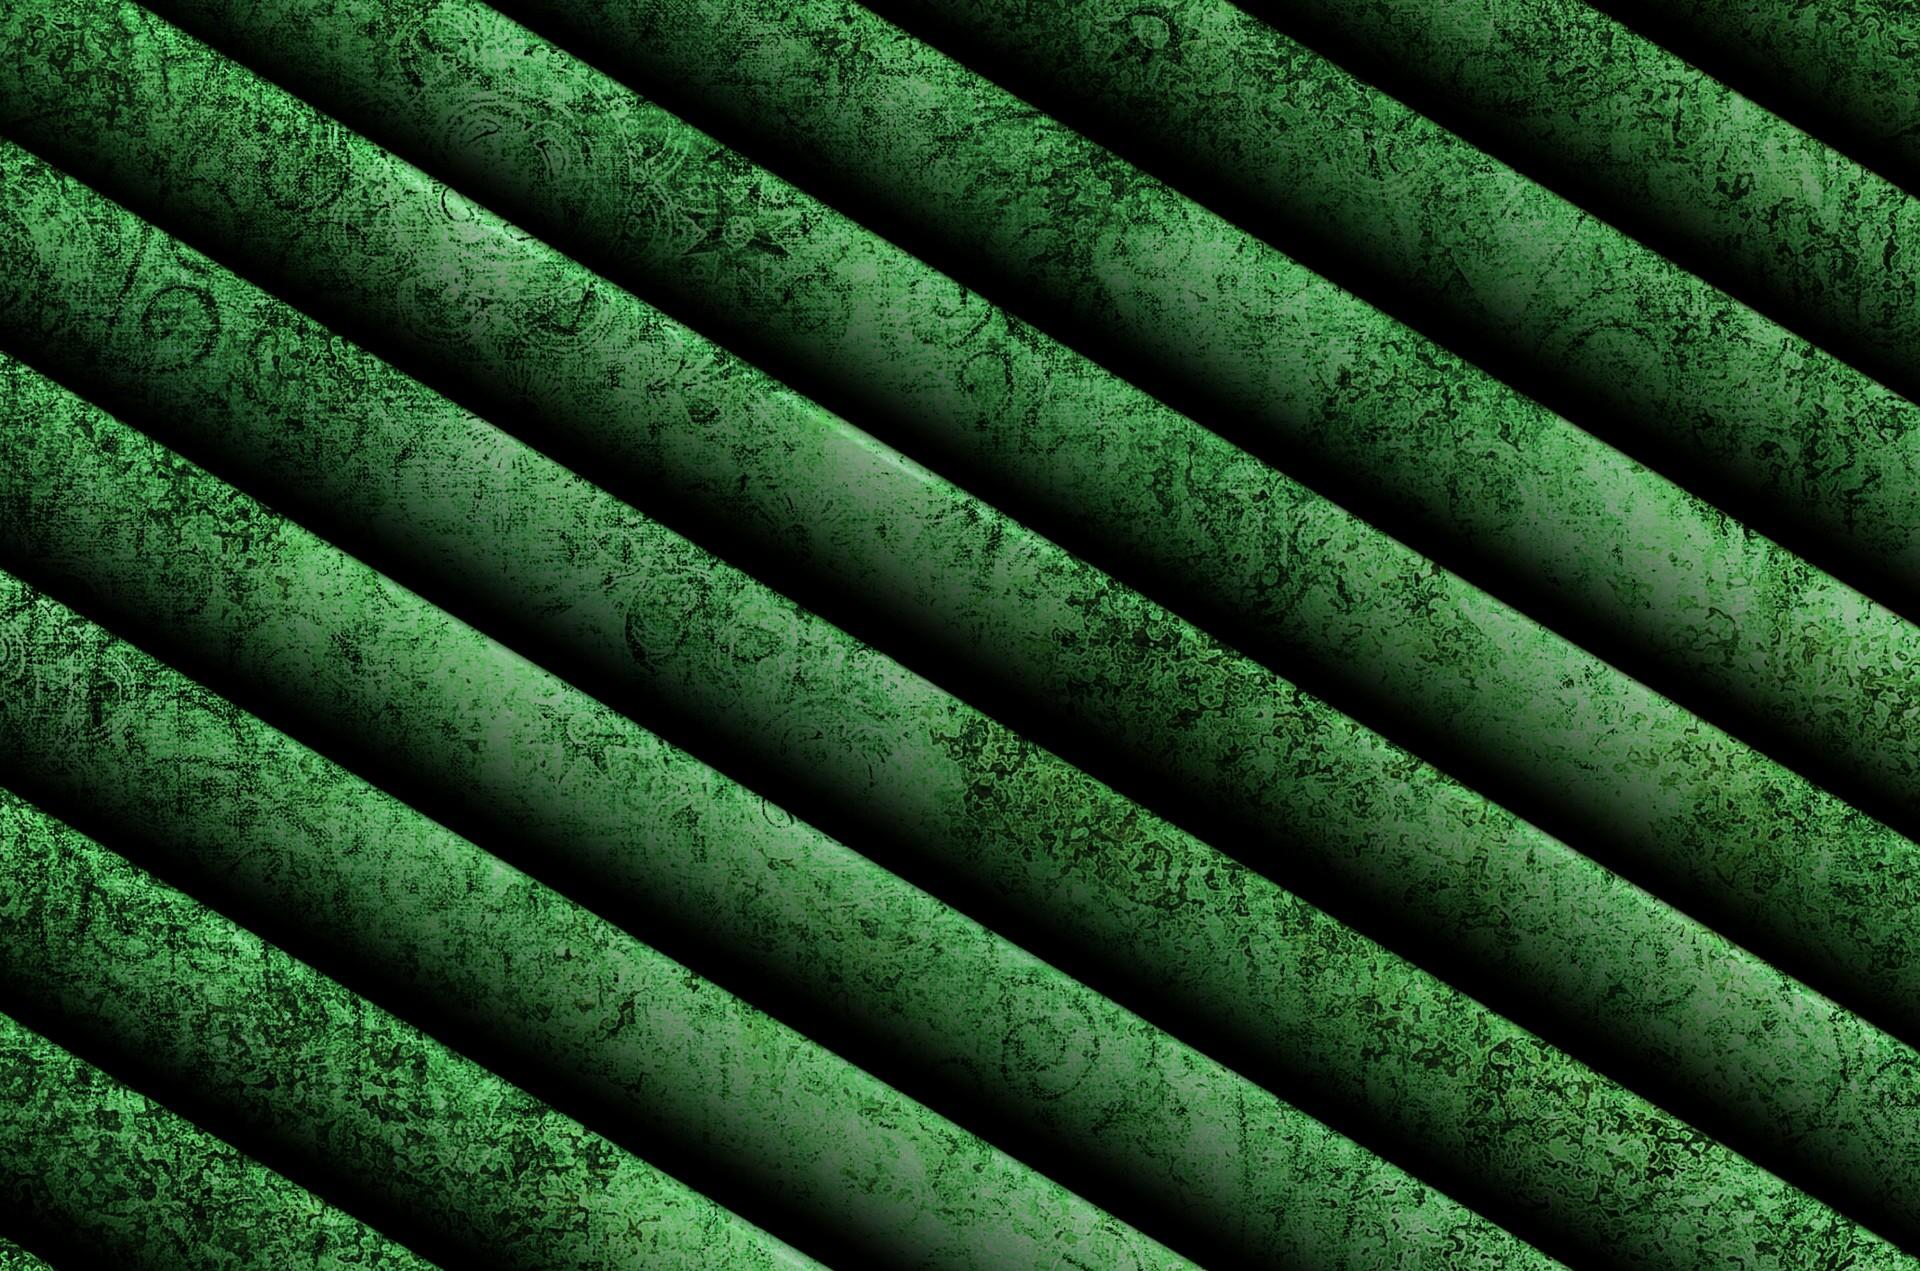 Black Vintage Wallpaper Green Diagonal Grunge Background Free Stock Photo Public